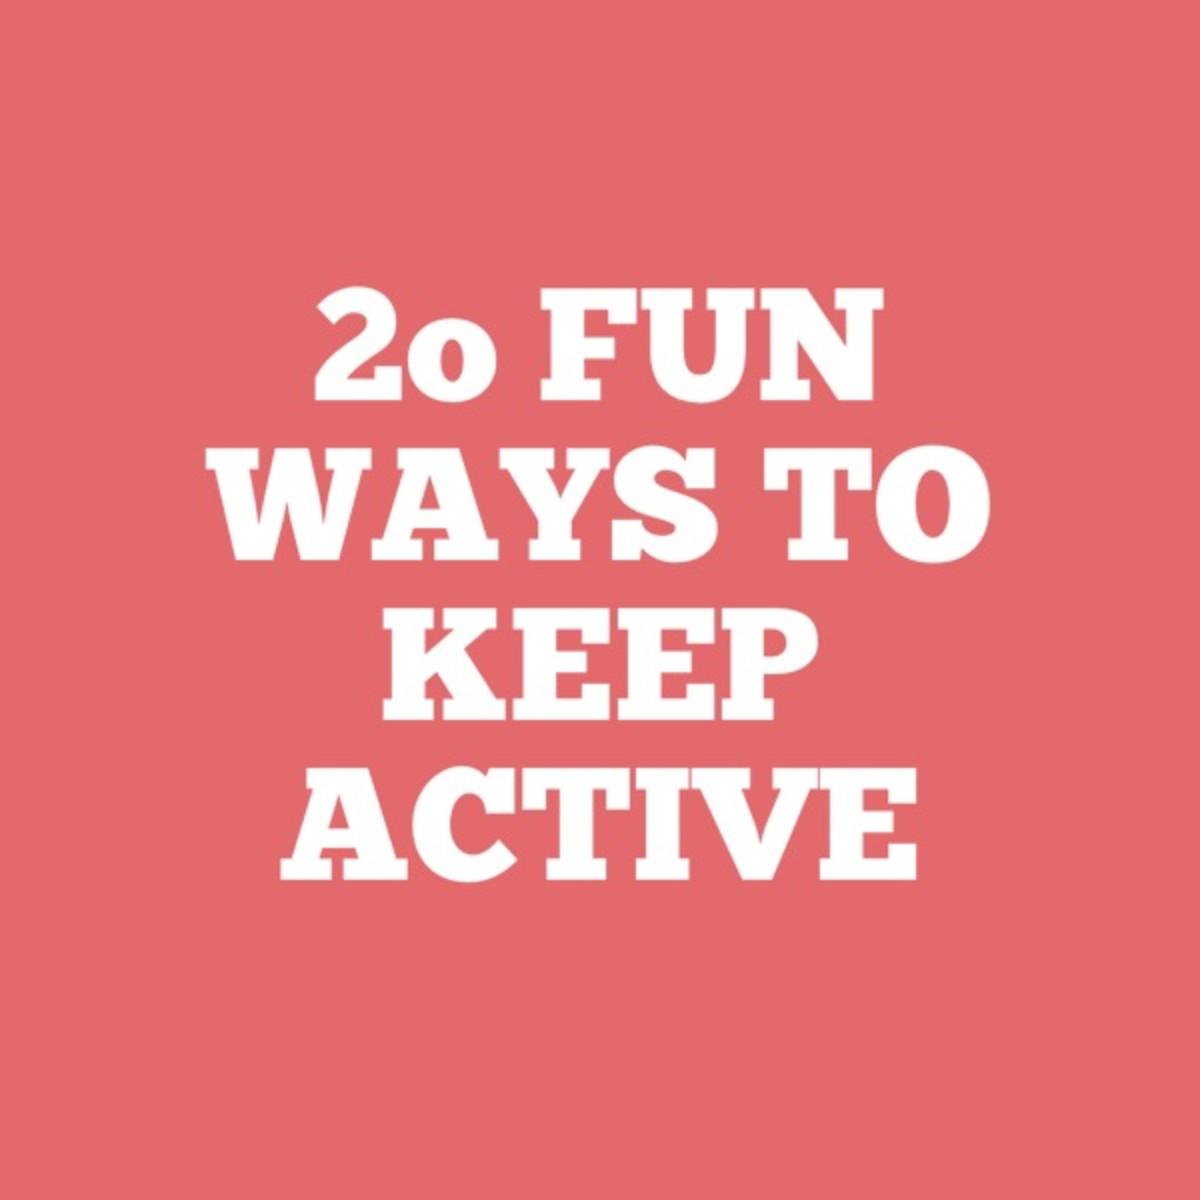 20 Fun Ways to Keep Active